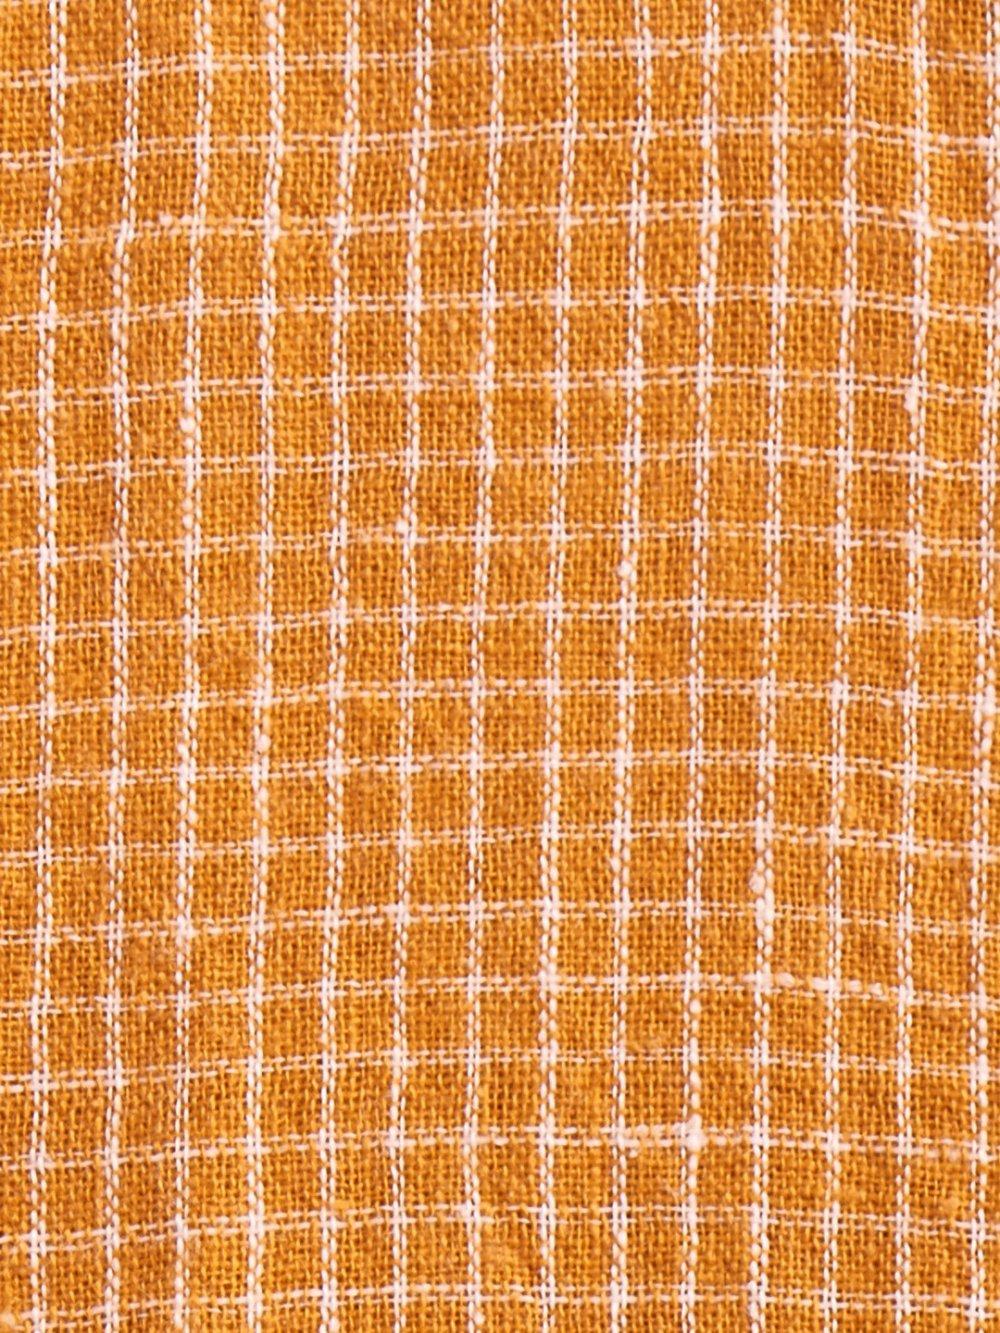 Organic Clothing Texture